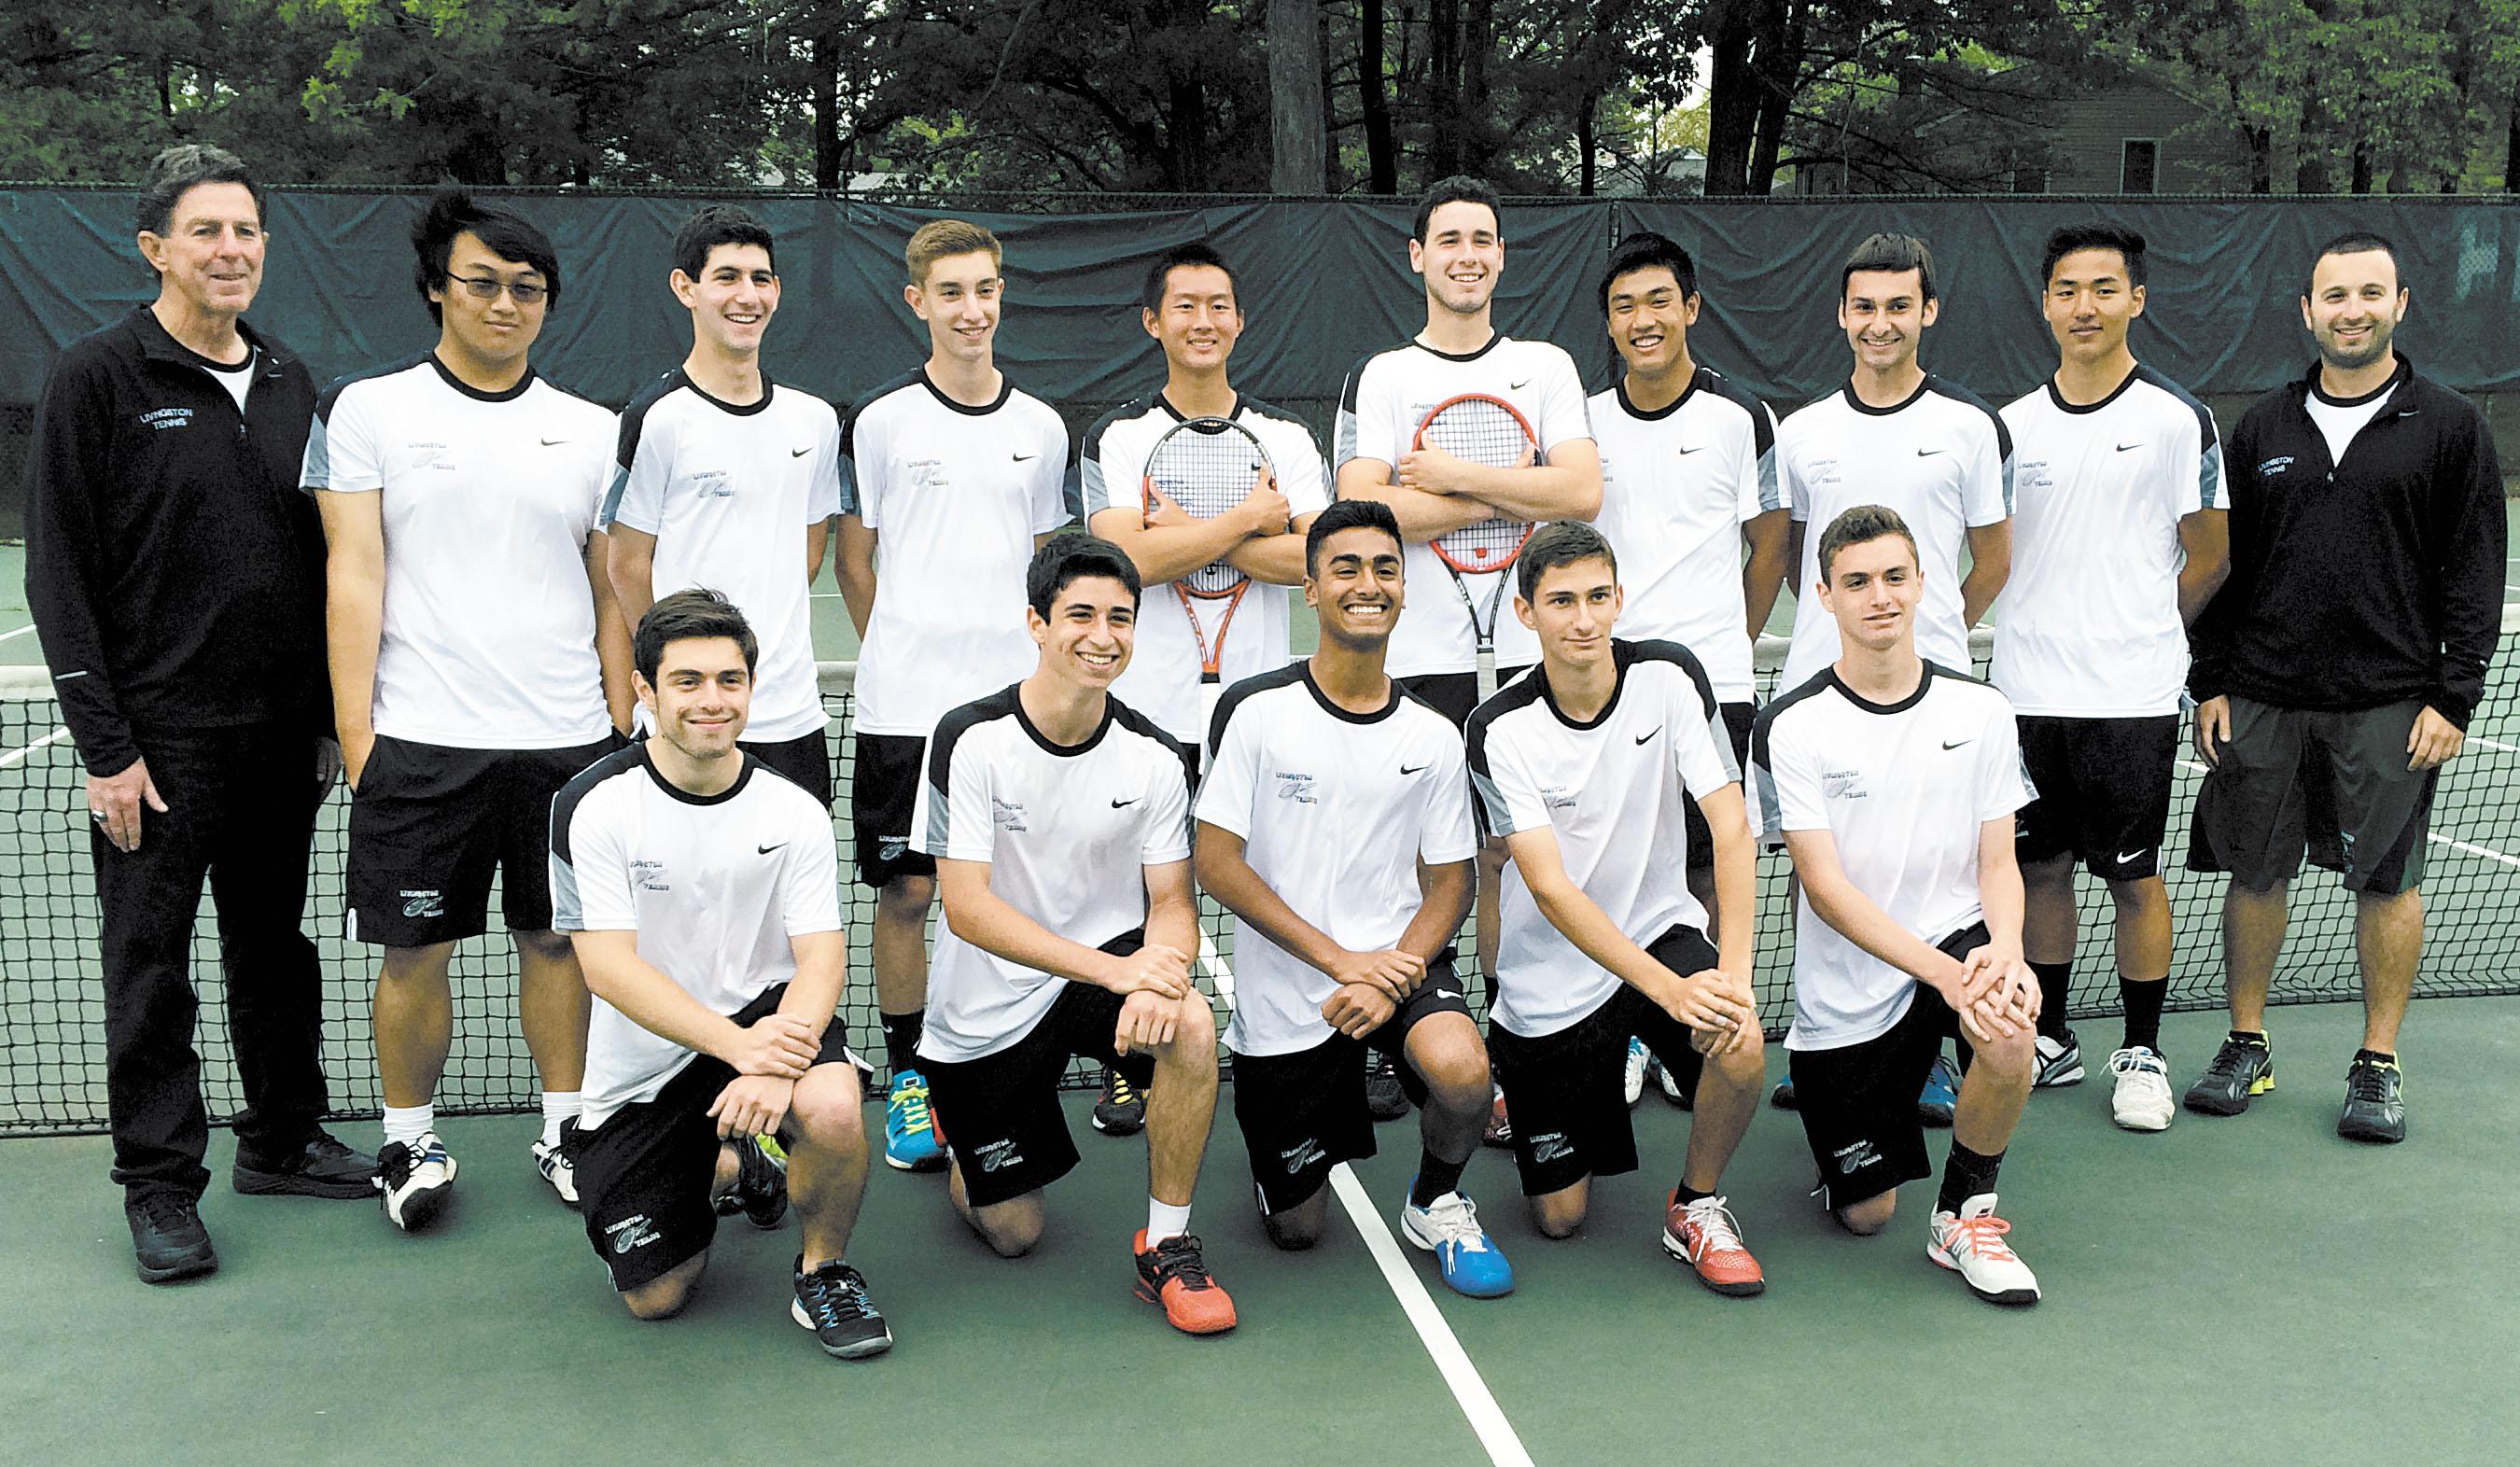 Livingston High School Boys' Tennis Team Wins Group IV State